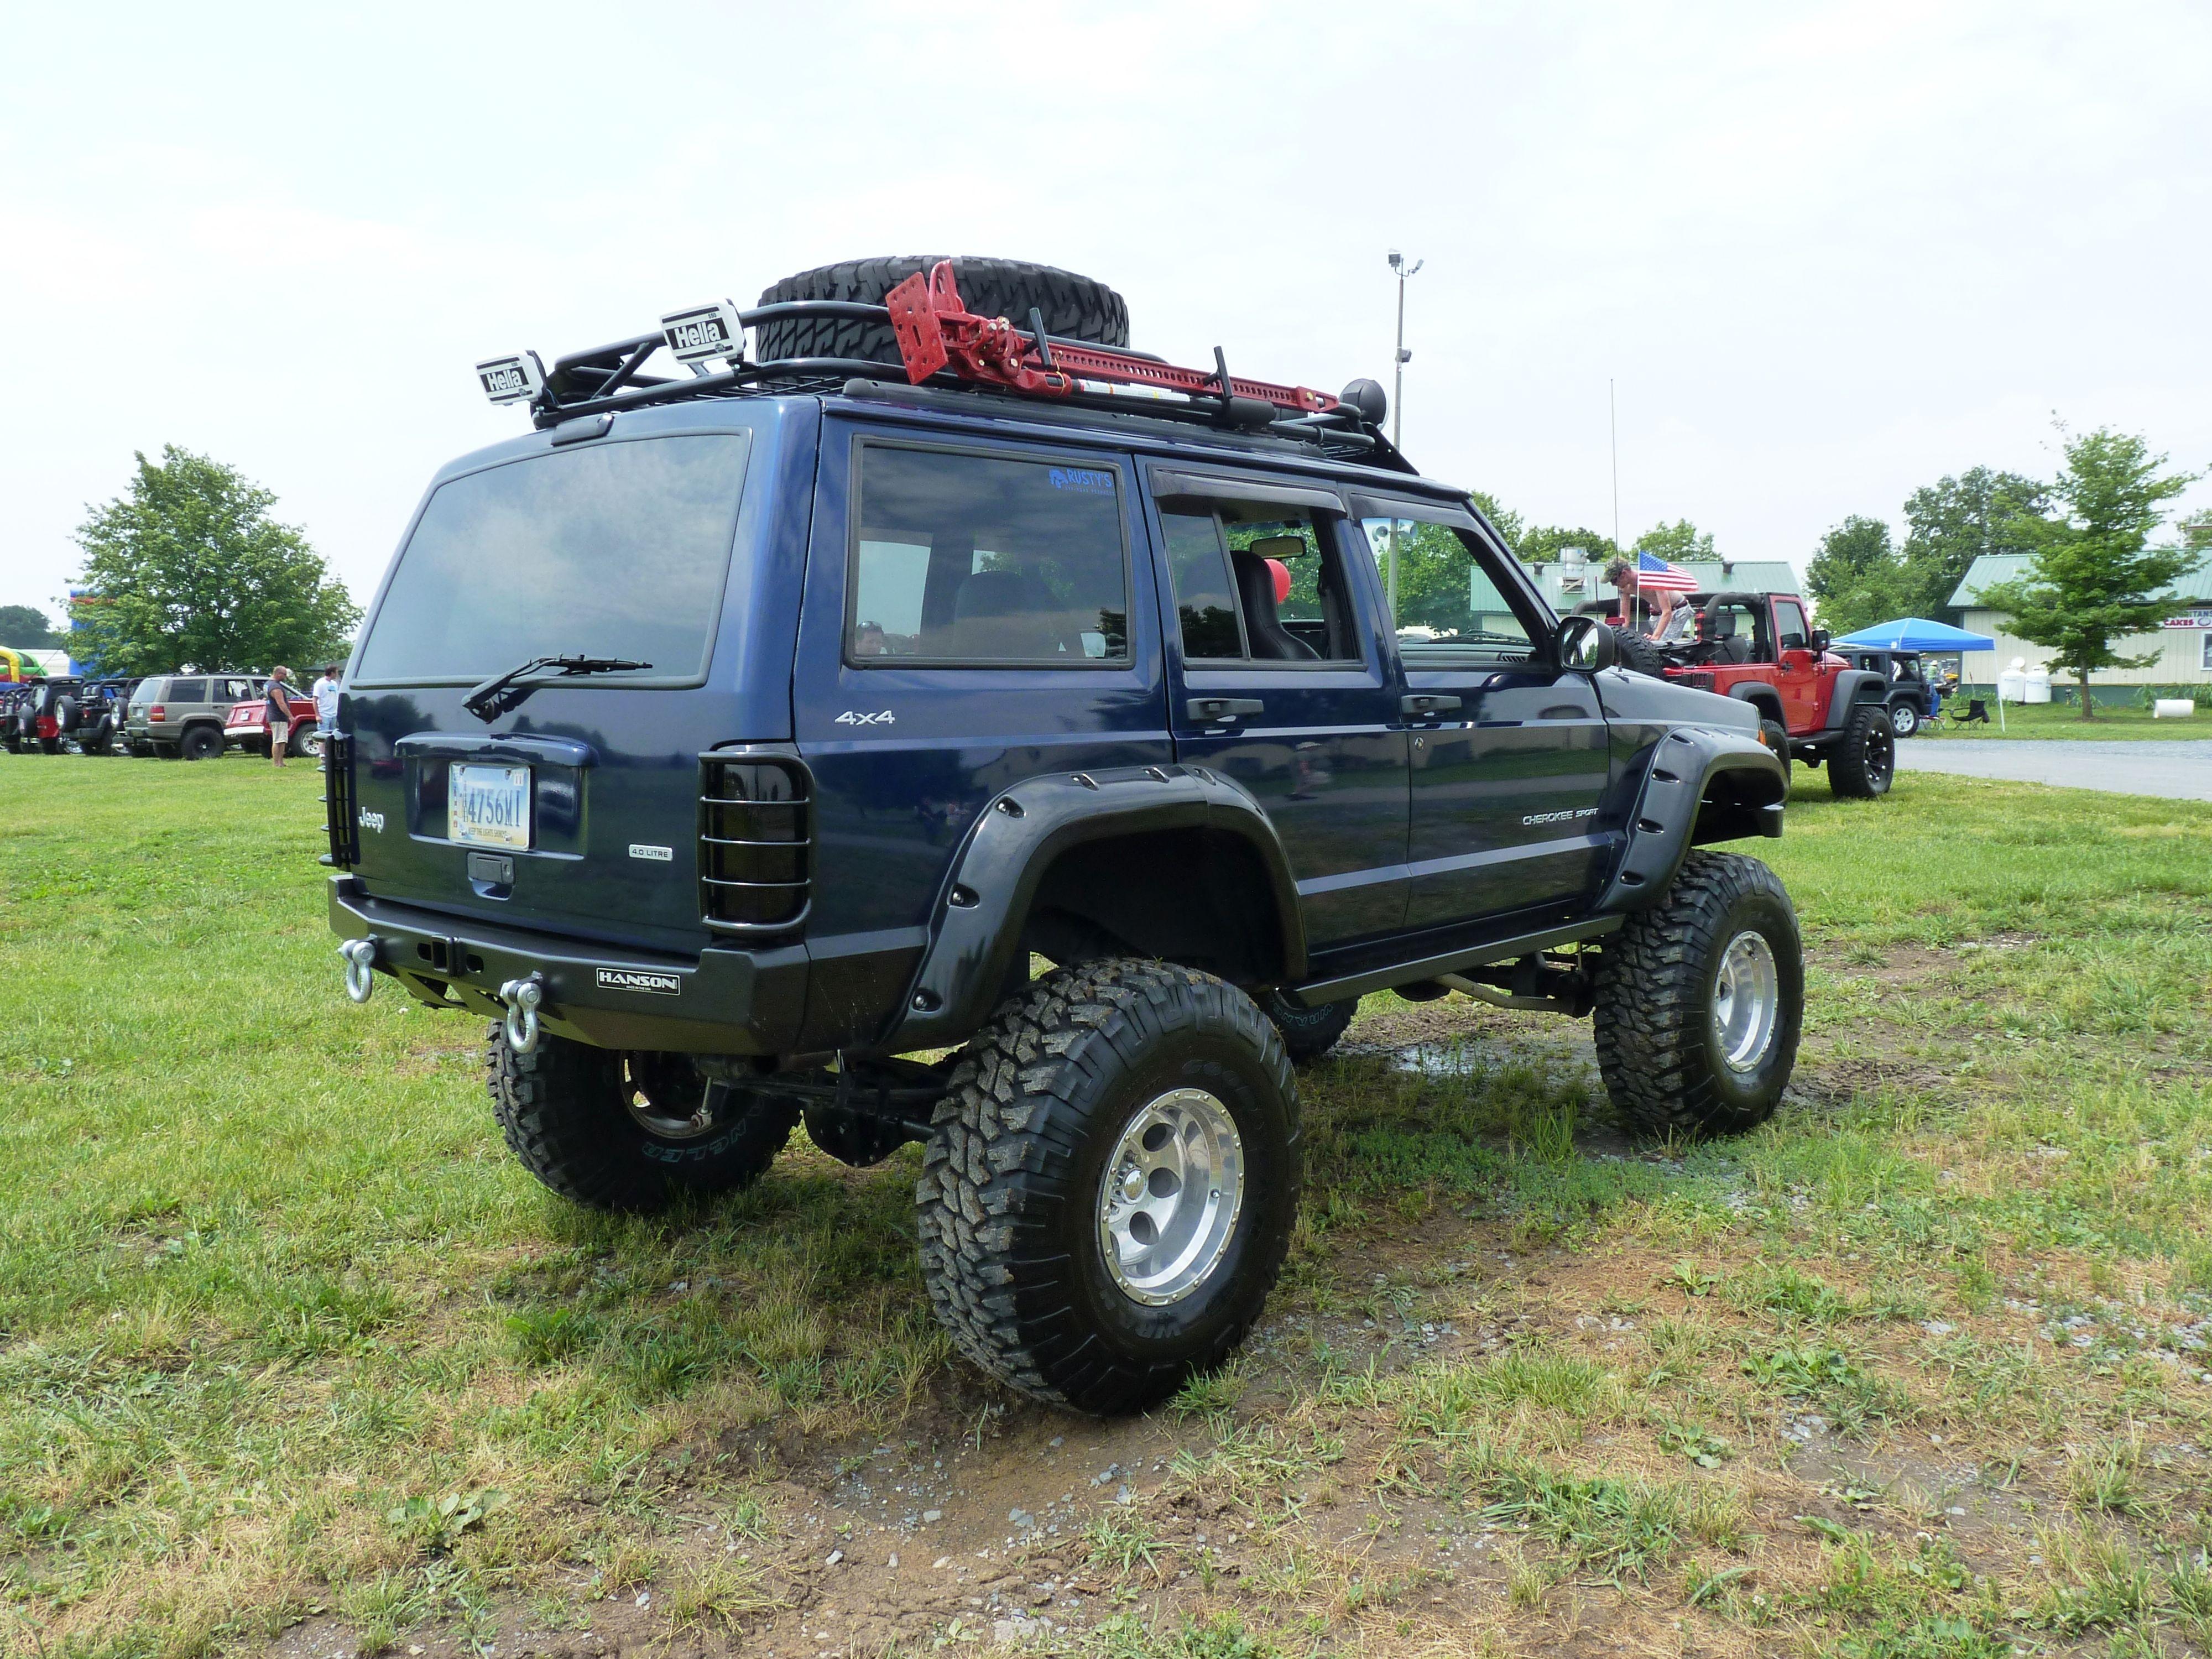 Hard Kor Safari Style Roof Rack Jeep Xj Jeep Xj Roof Rack Jeep